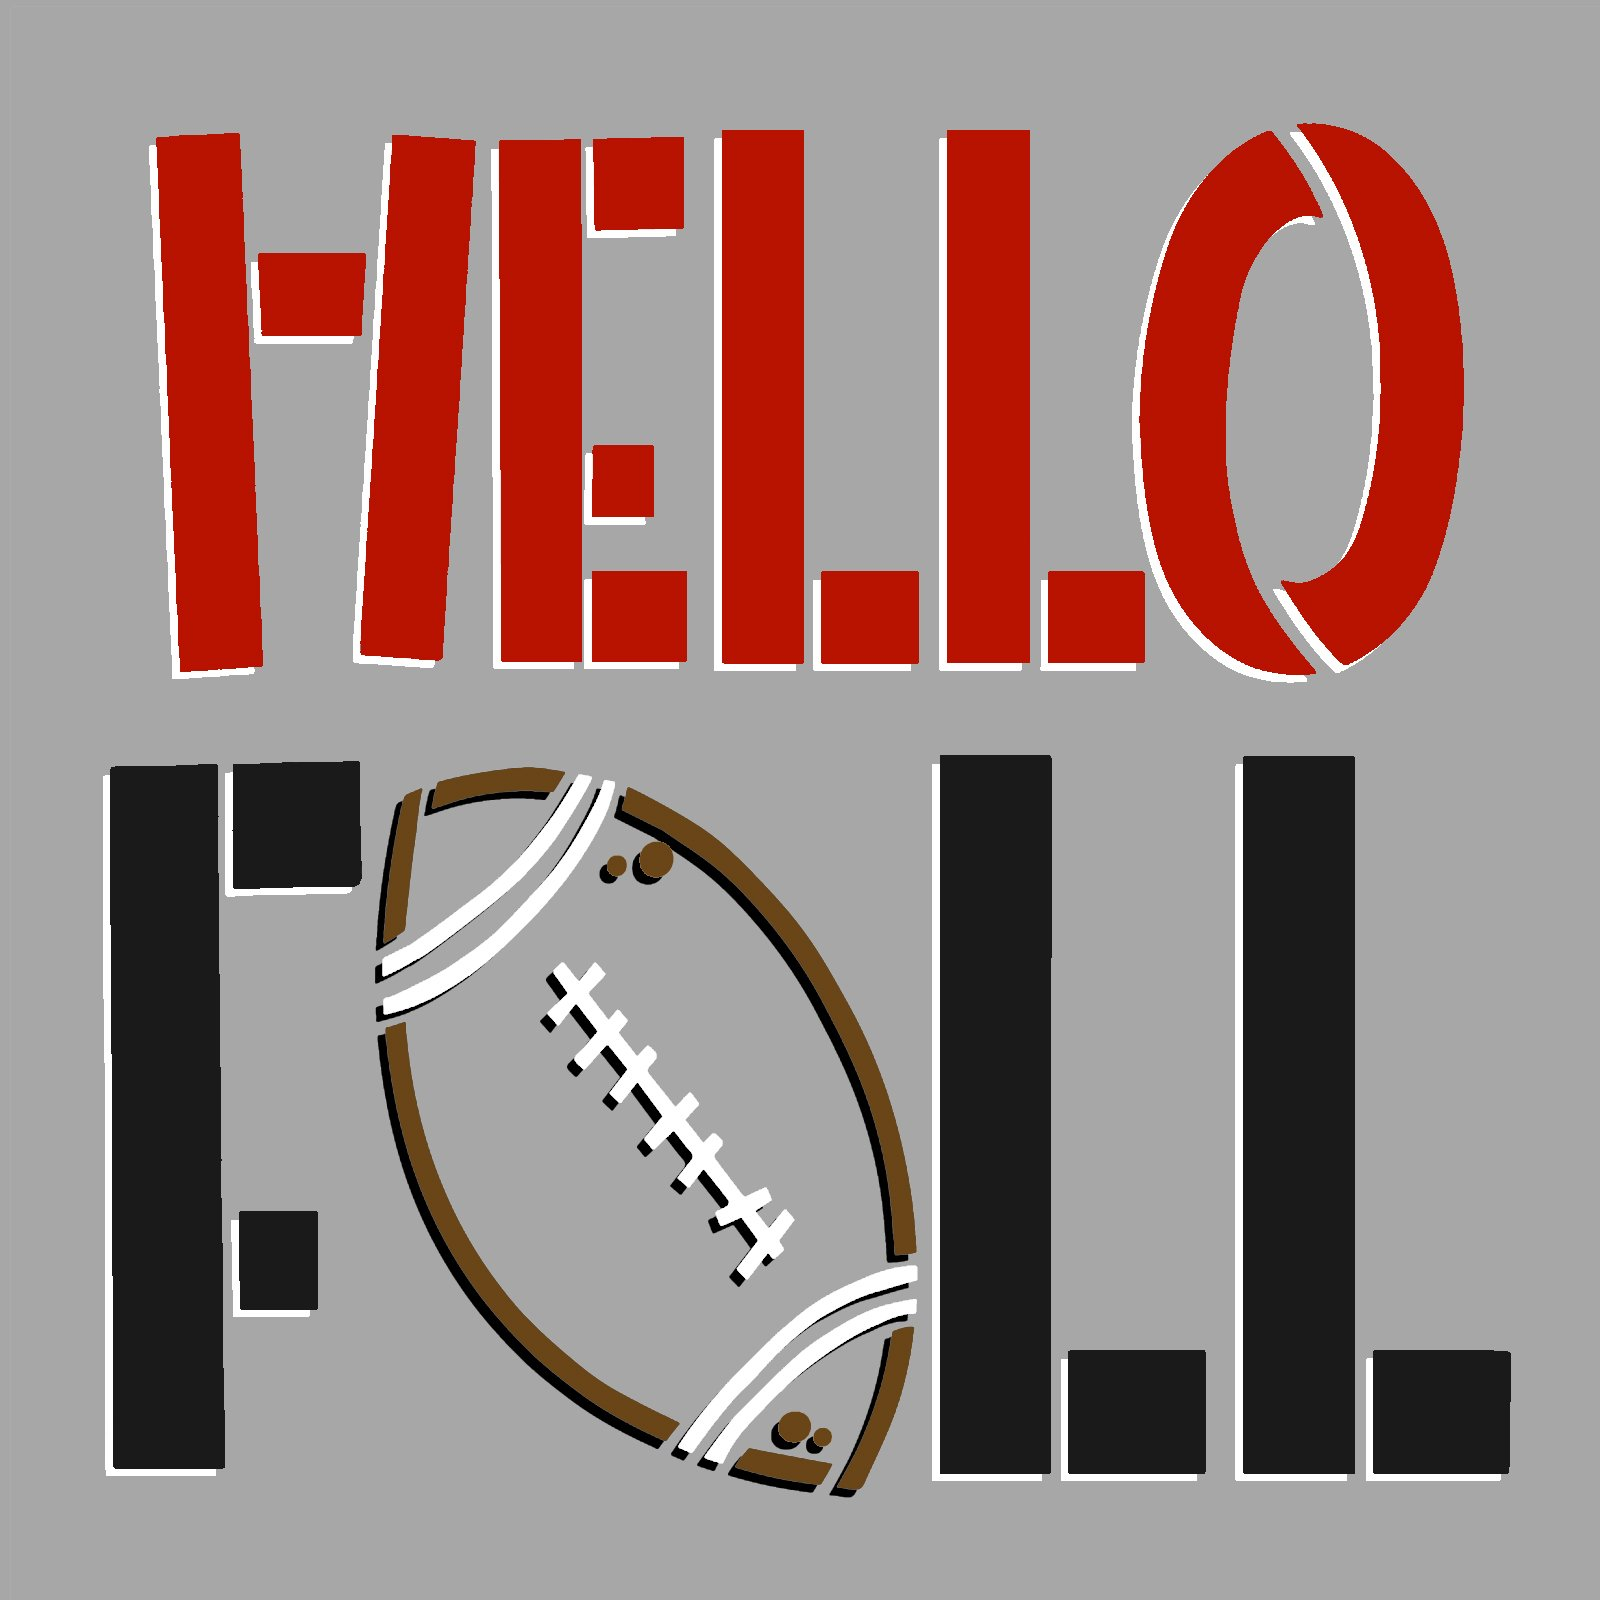 Hello Fall Football Stencil by StudioR12   DIY Autumn School Sport Team Home Decor   Craft & Paint Wood Sign   Reusable Mylar Template   Select Size